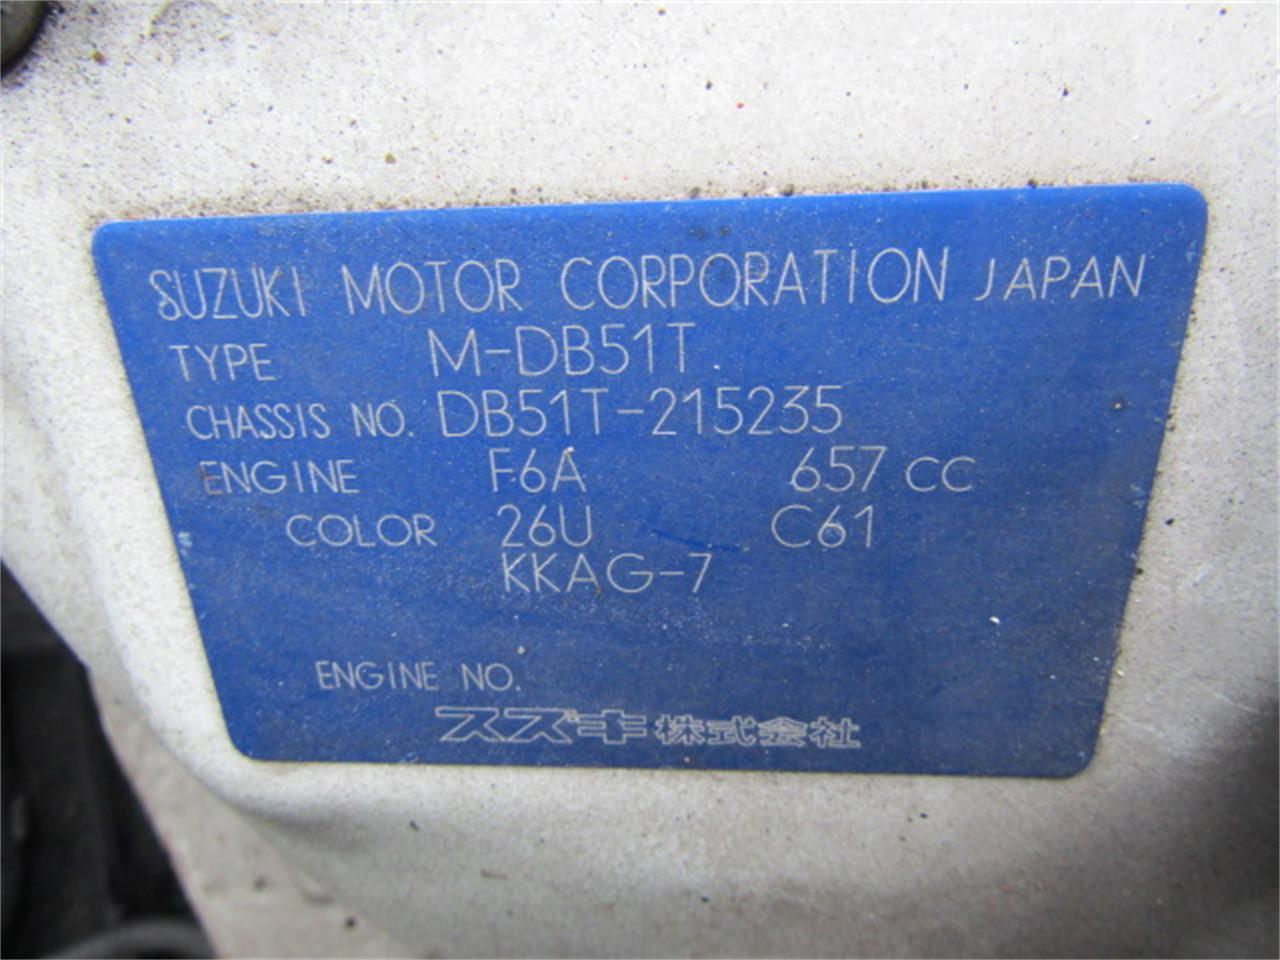 Large Picture of '91 Suzuki Carry - $7,989.00 - KIFI